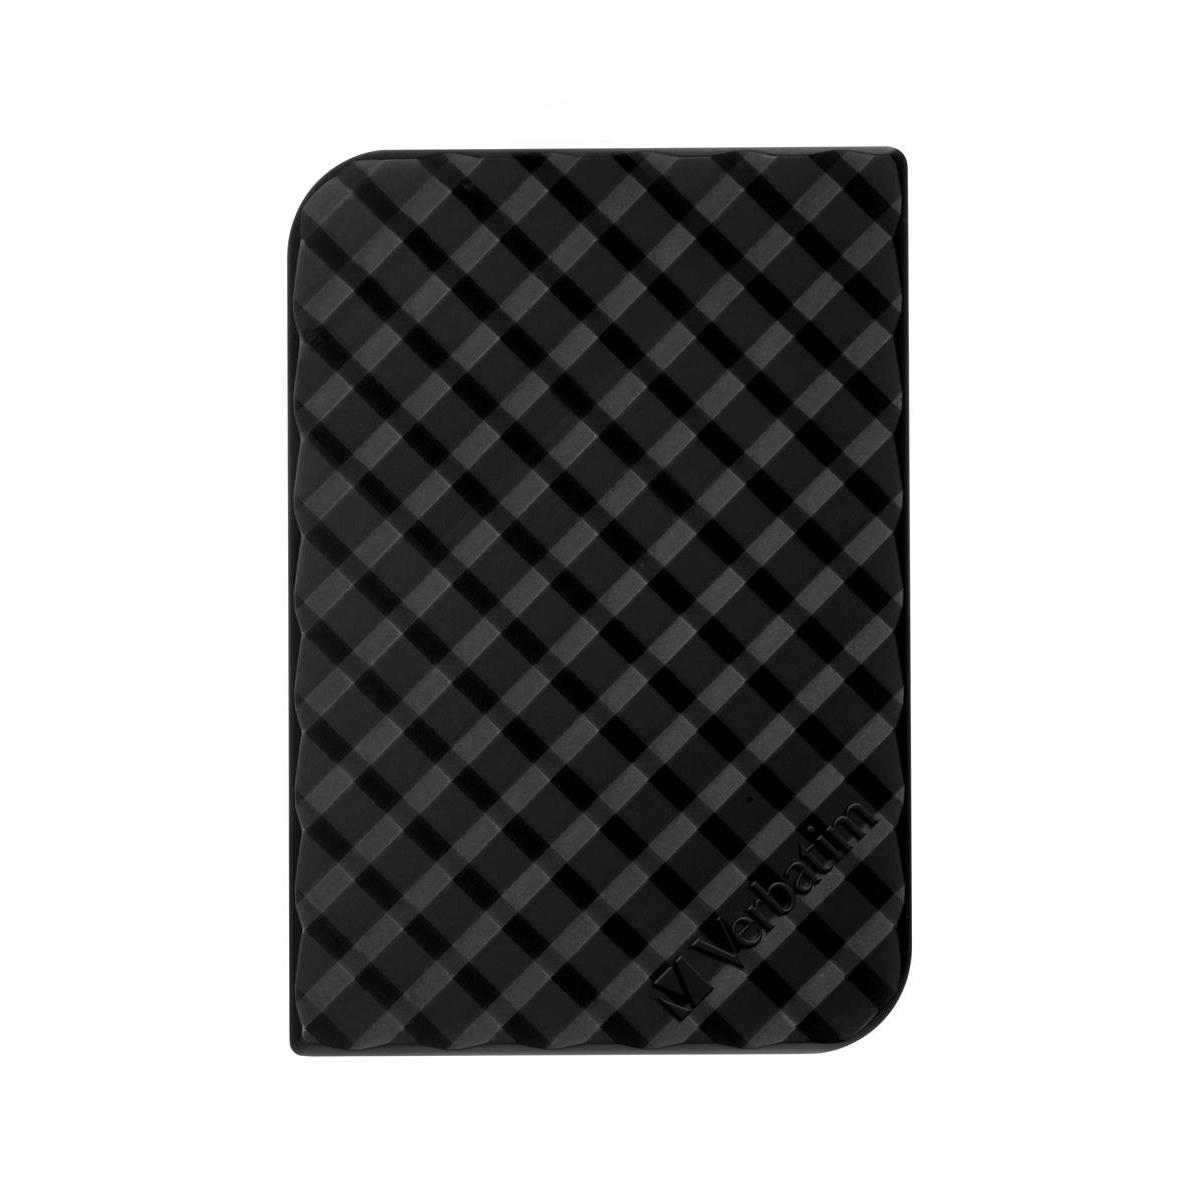 Verbatim Portable Hard Drive 2TB Black Ref 53195